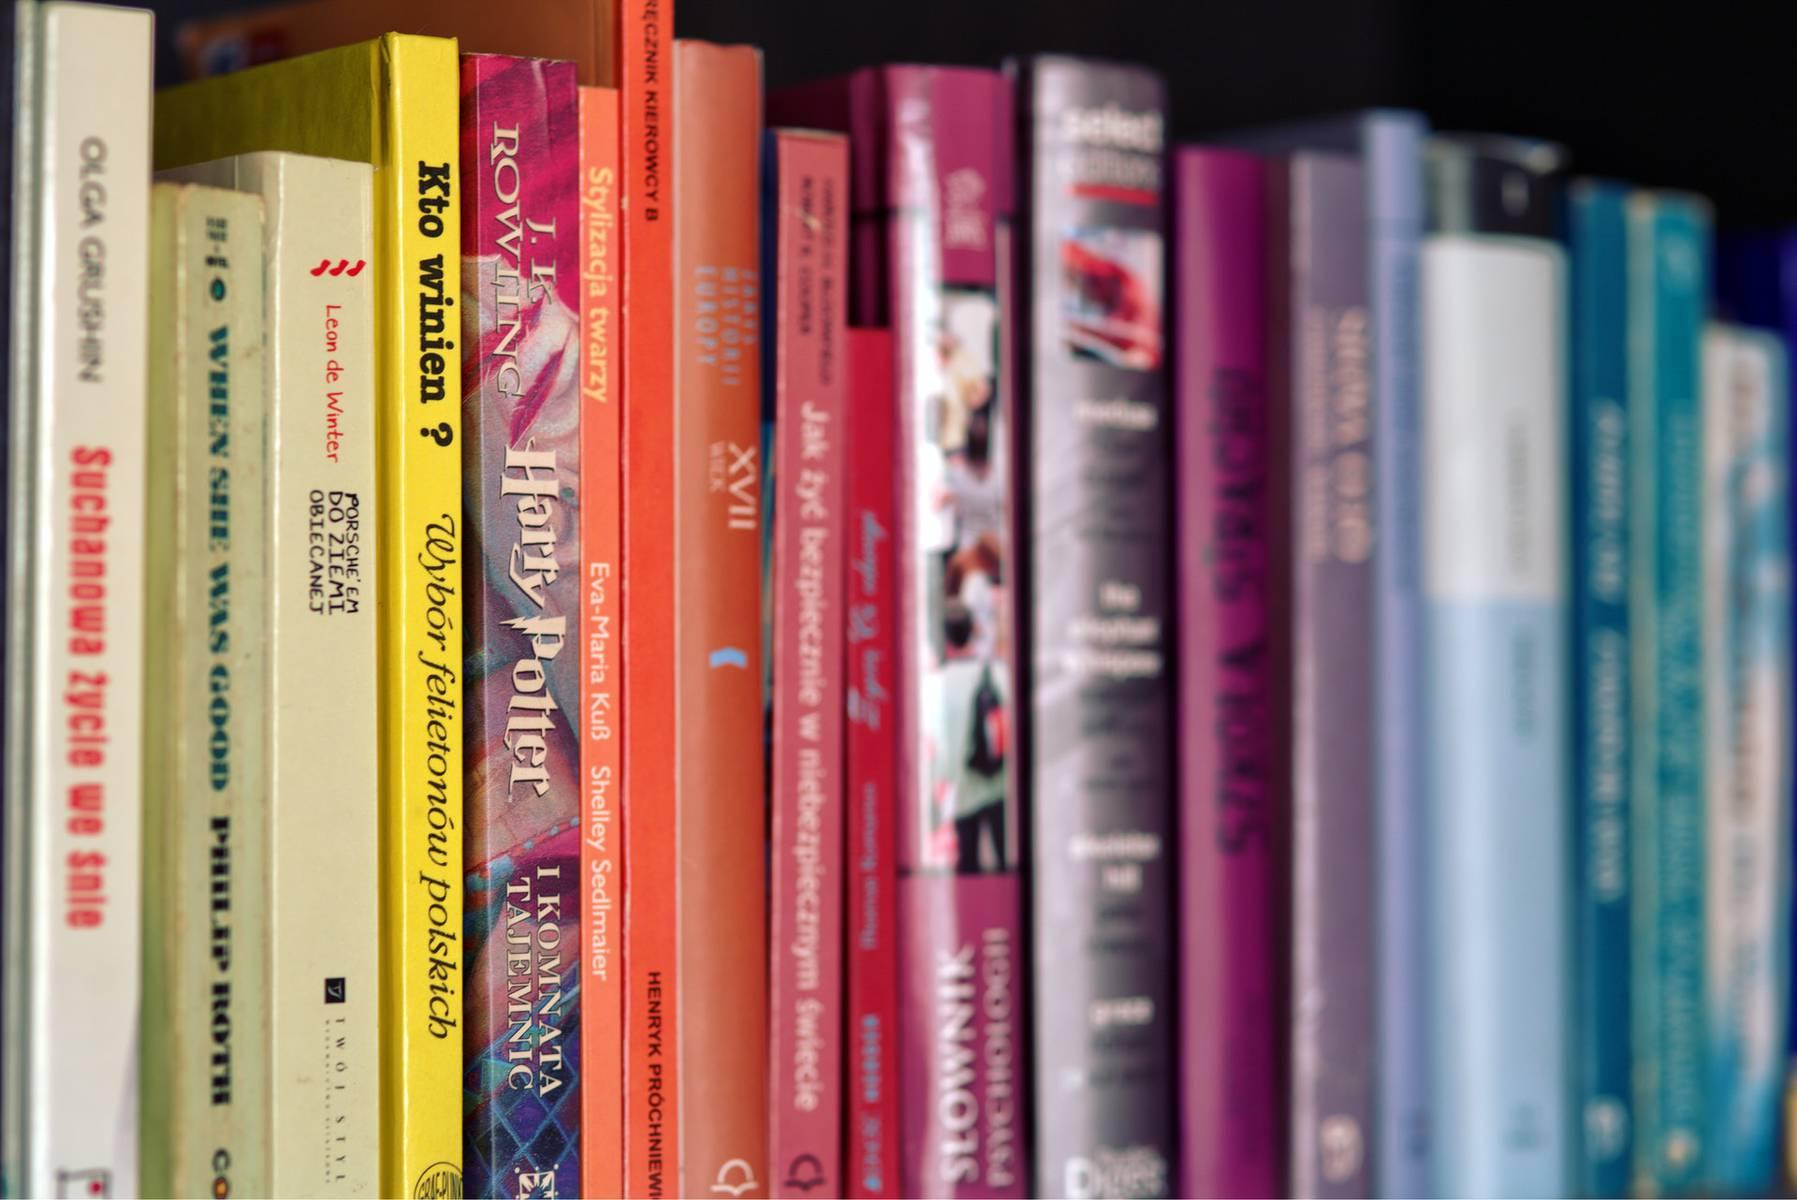 colorful-books-on-shelf-5710.jpg